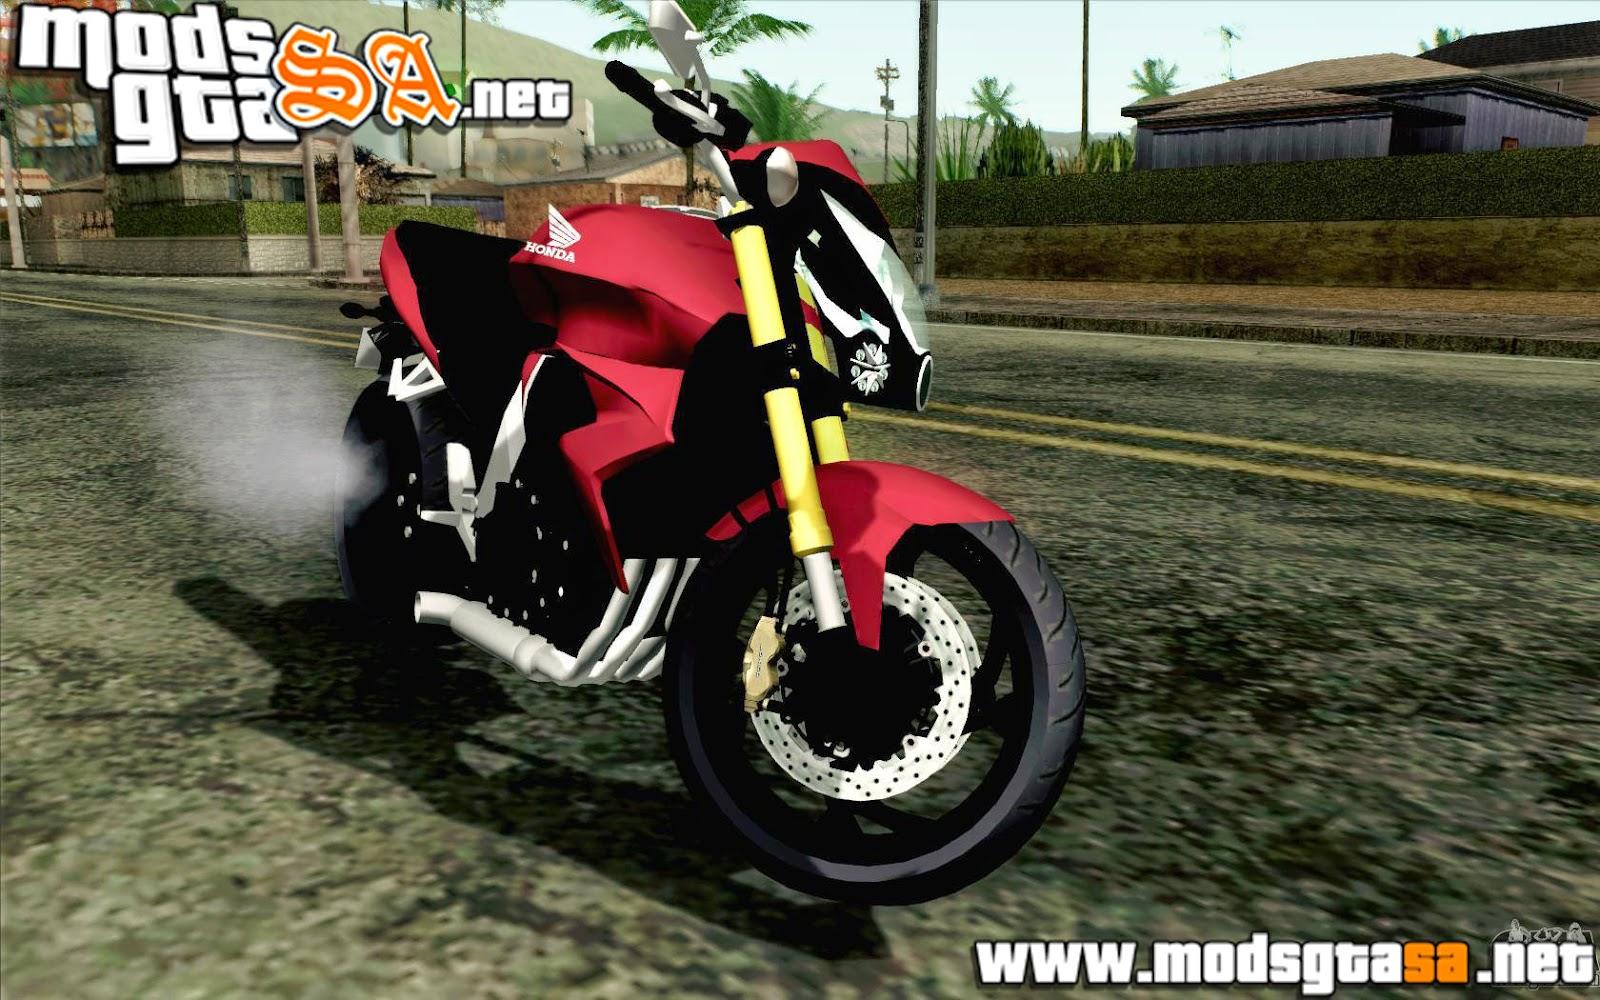 SA - Honda CB1000R